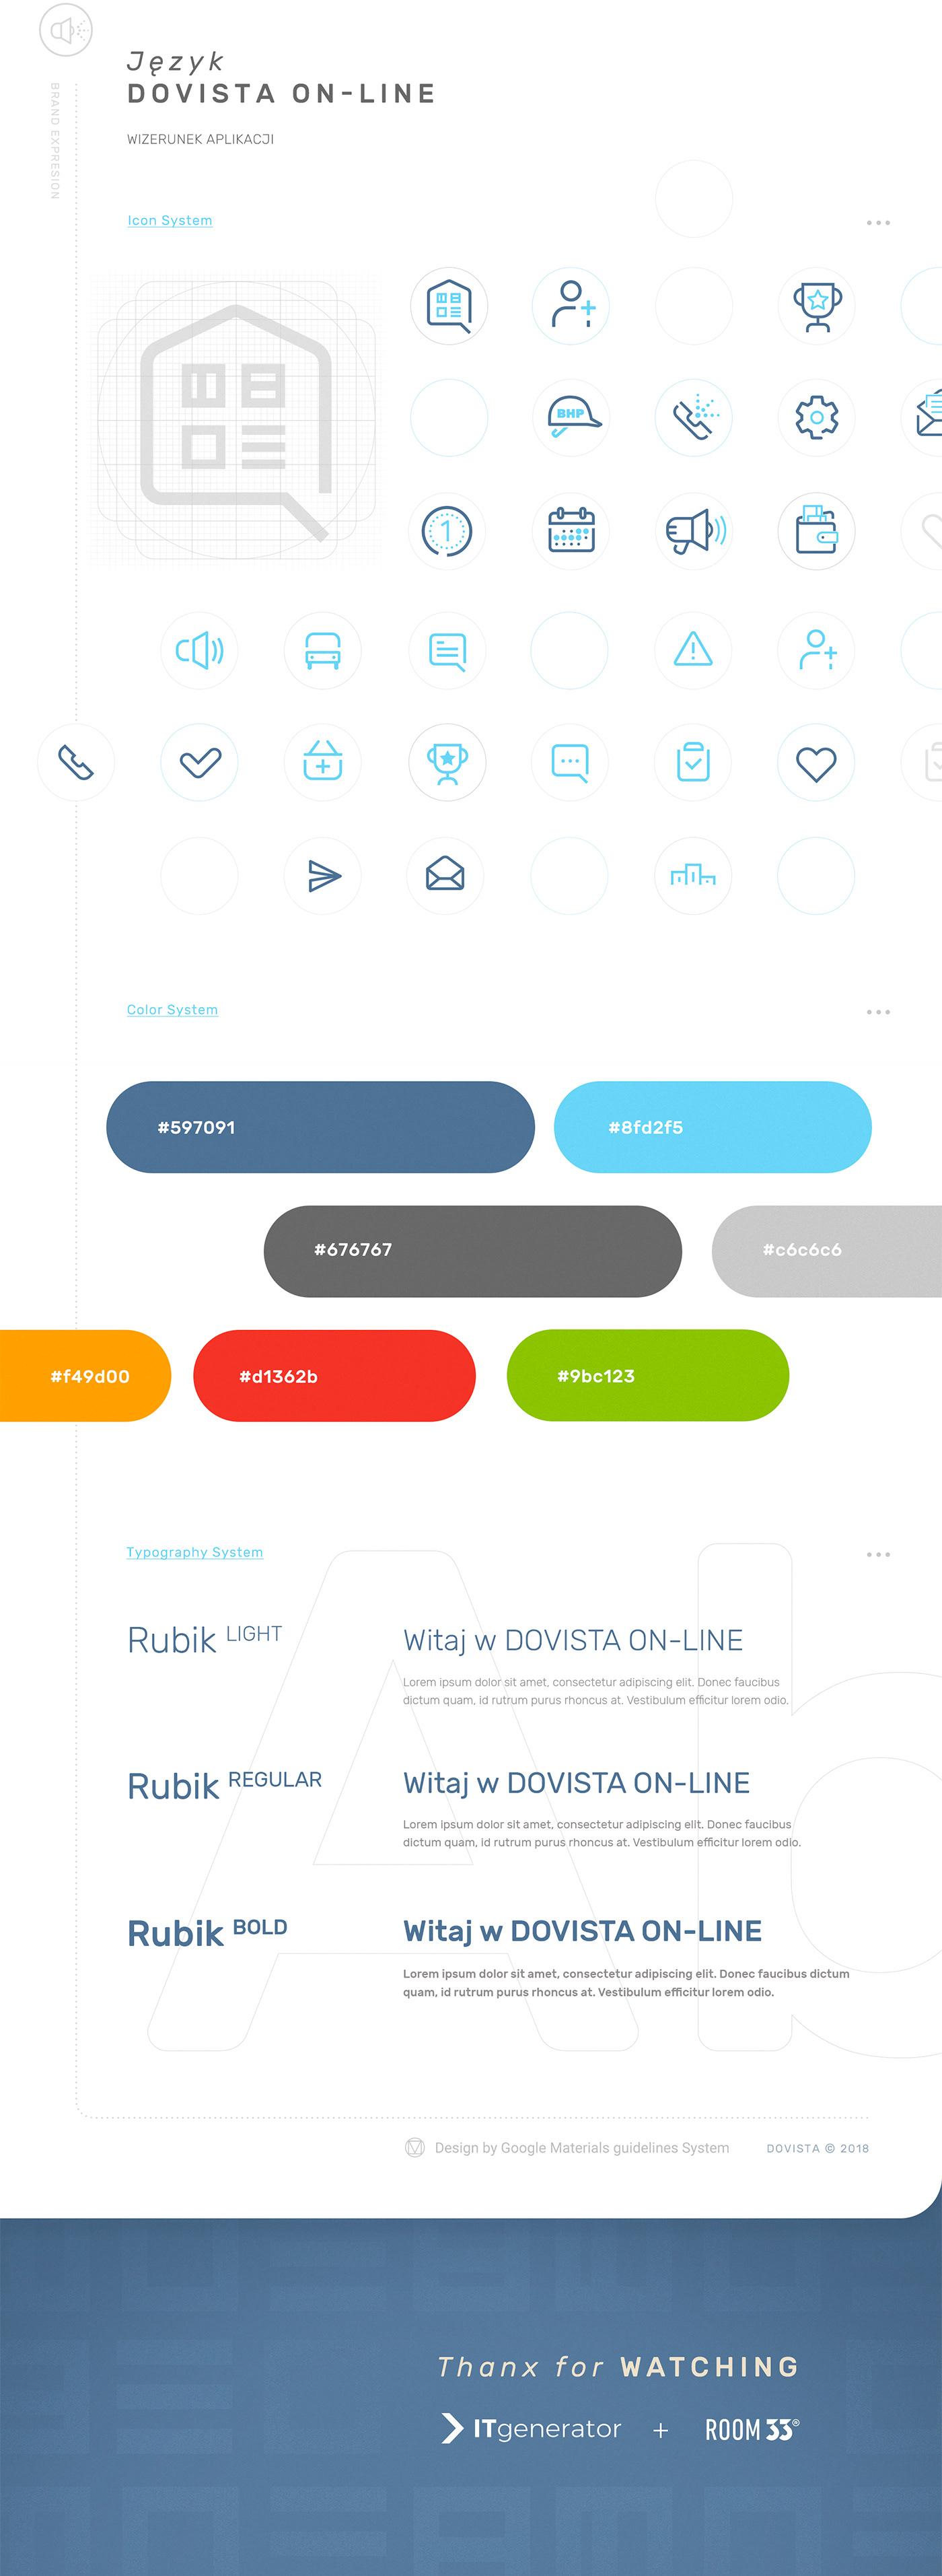 aplikacja mobilna Mobile app app design projekt aplikacji business app ux UI Interface app itgenerator